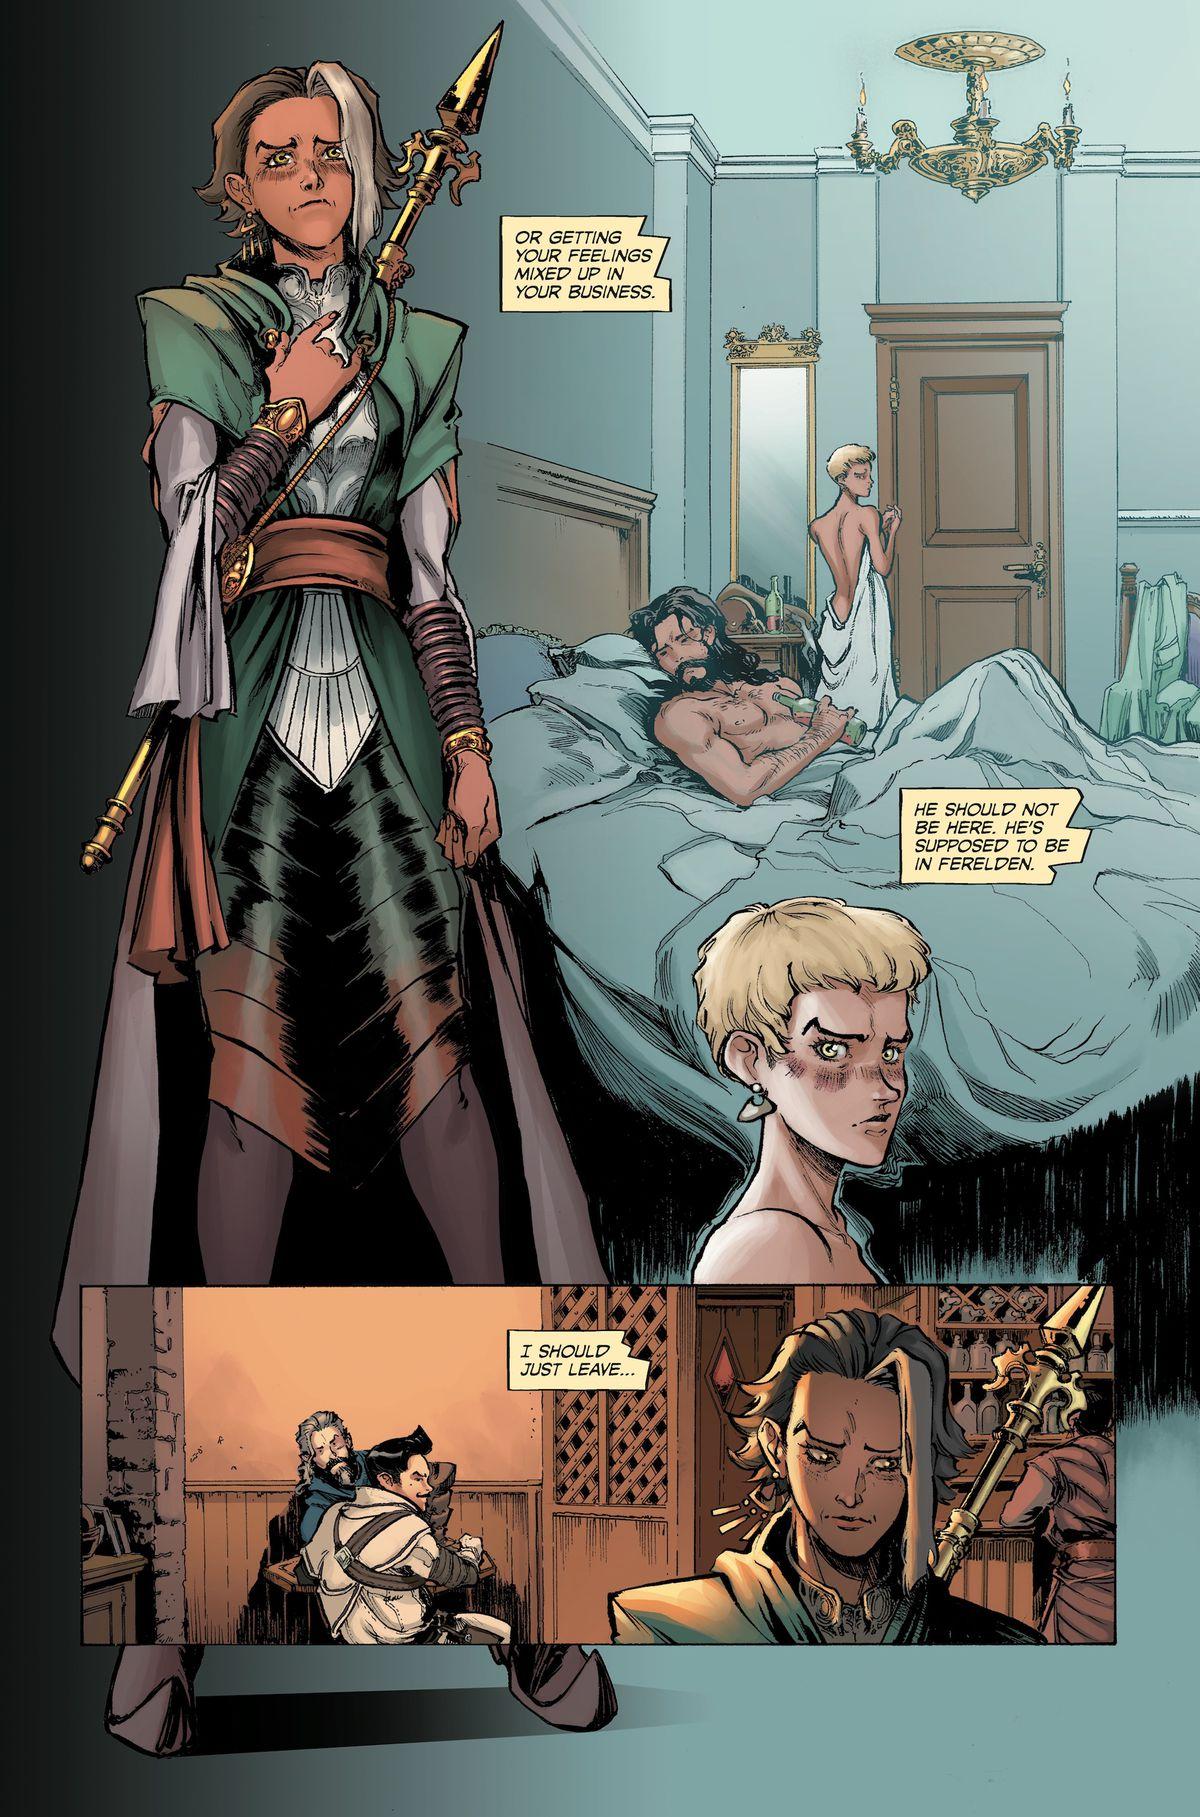 From Dragon Age: Deception #1, Dark Horse Comics (2018).